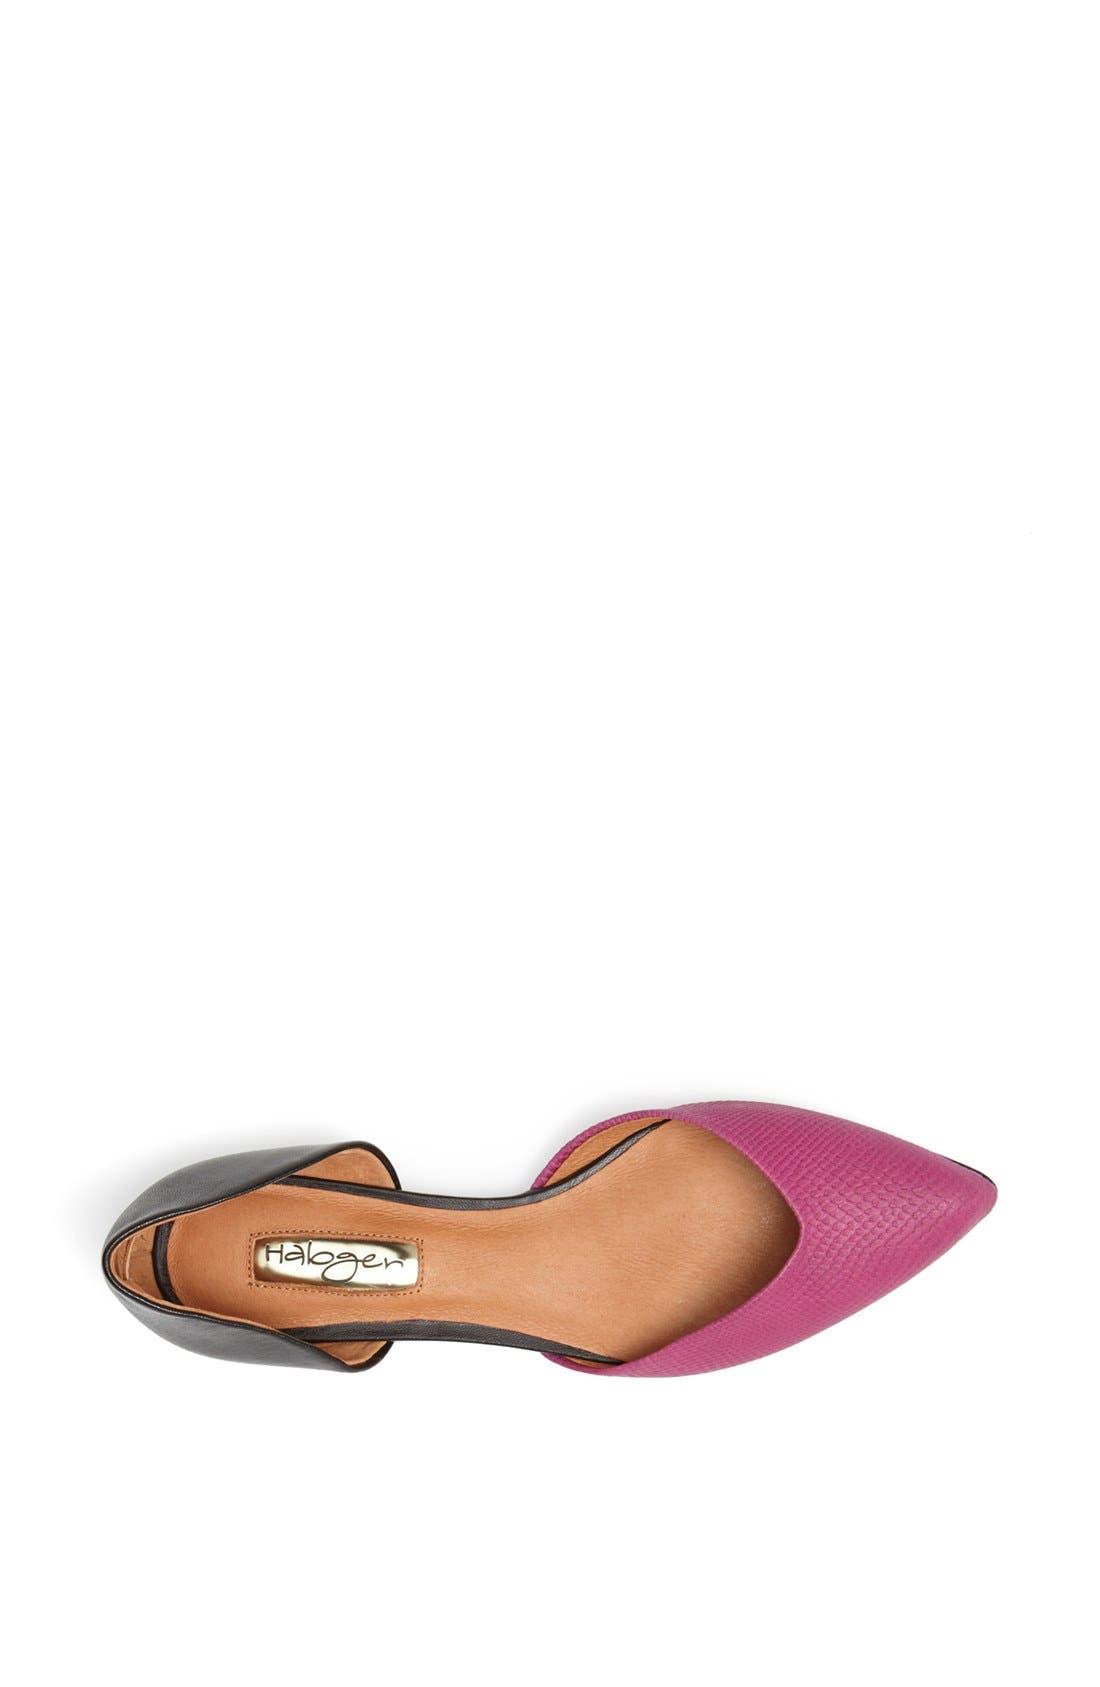 'Leta' d'Orsay Flat,                             Alternate thumbnail 3, color,                             Magenta/ Black Nappa